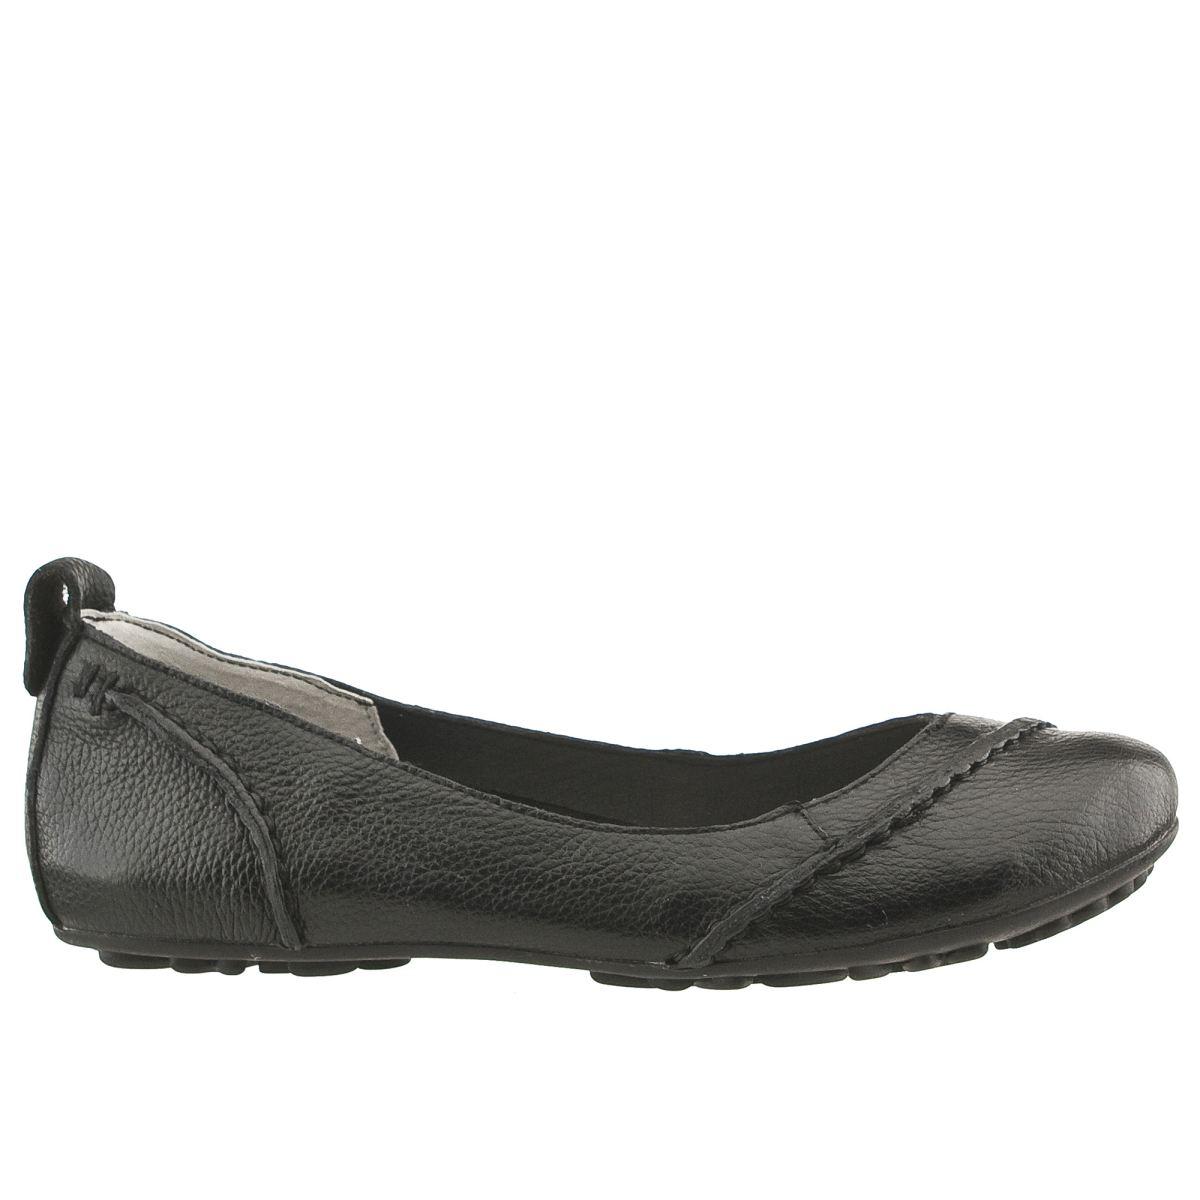 hush puppies black janessa flat shoes